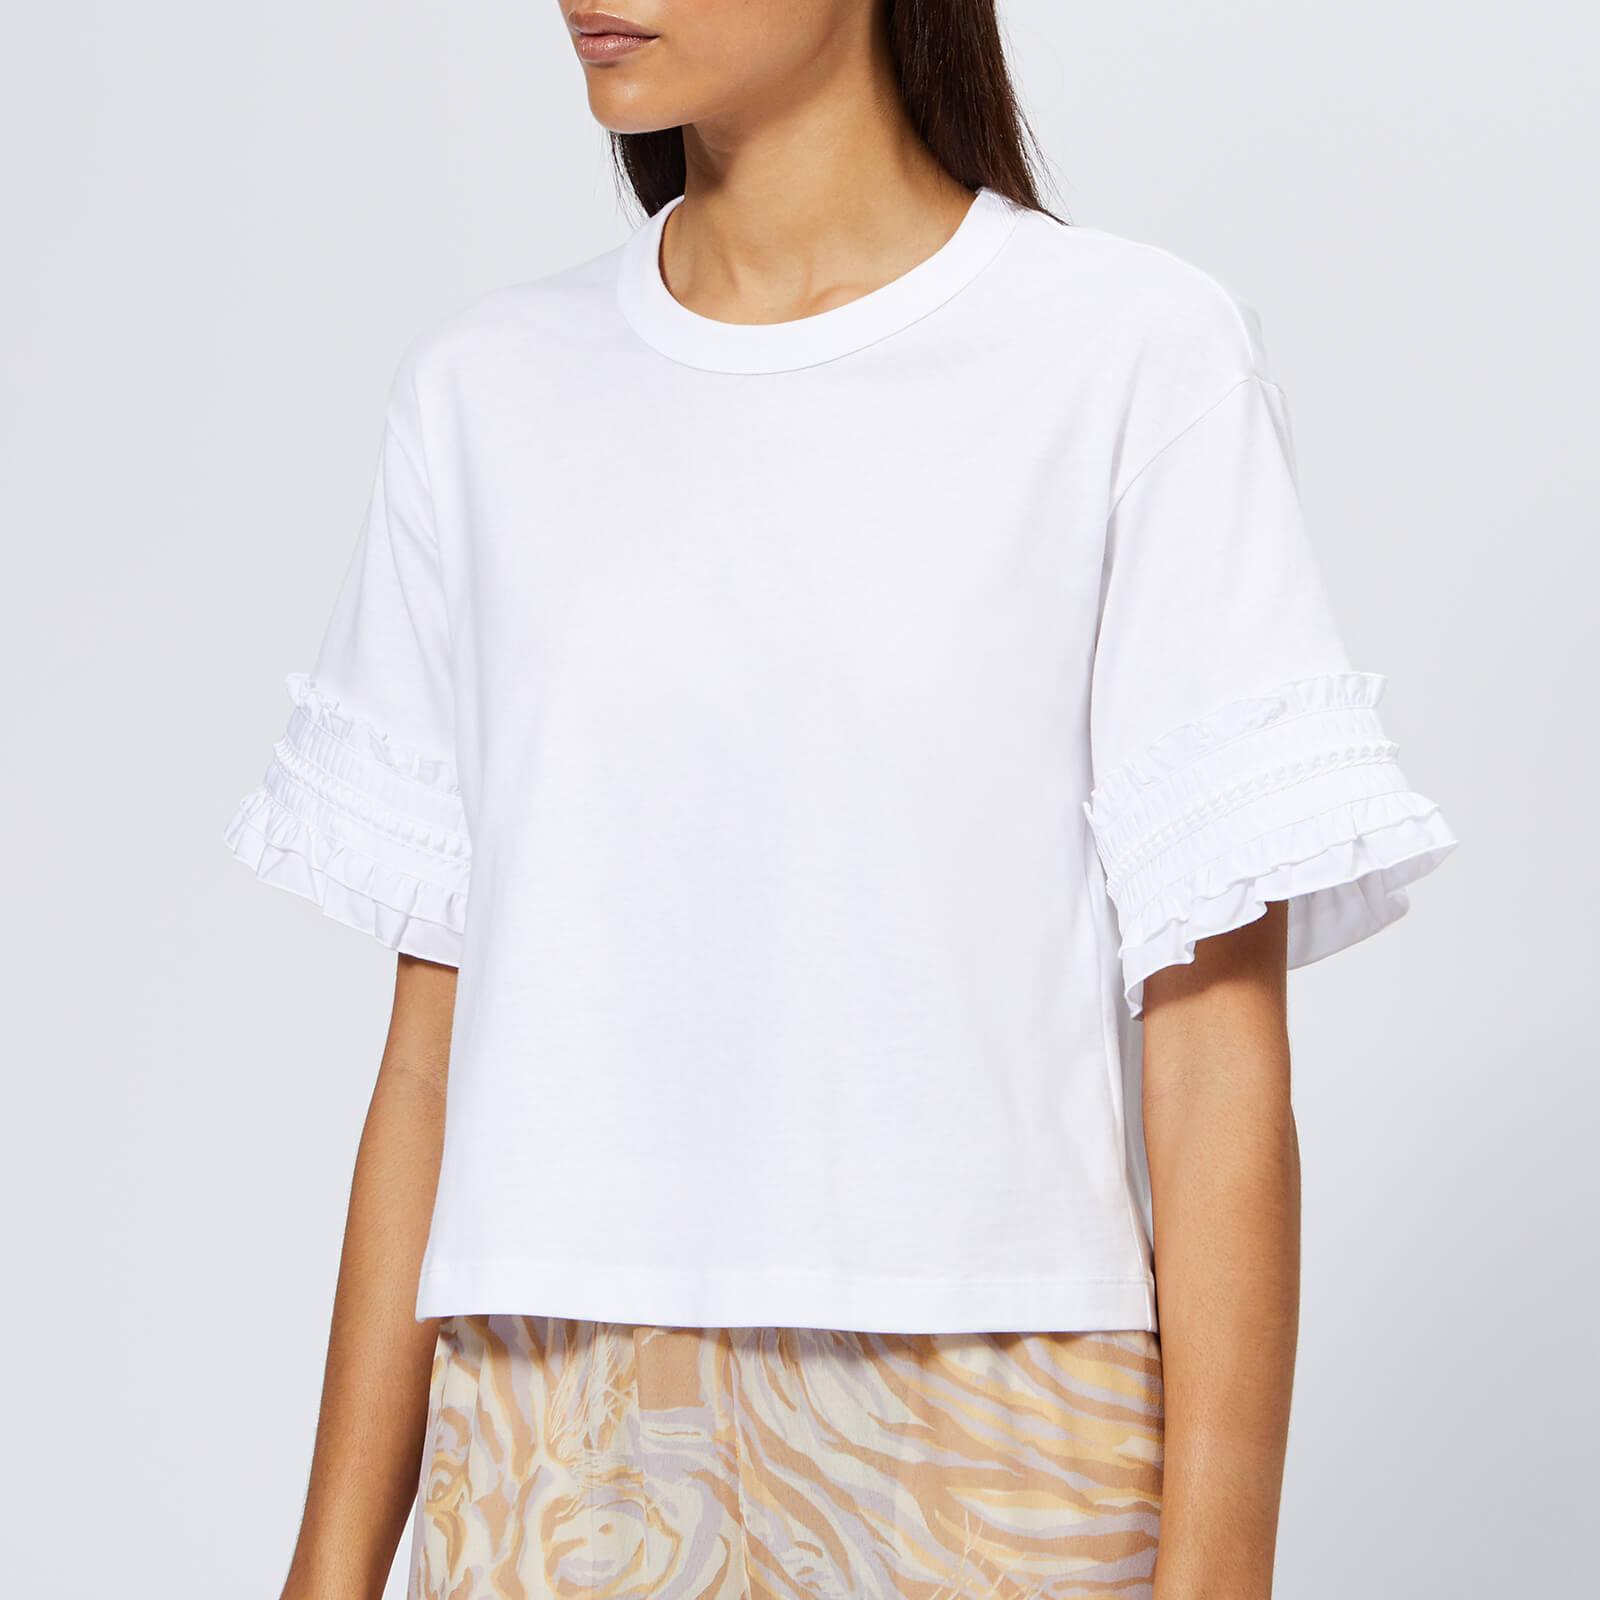 263fc0f0f7 See By Chloé Women's Sleeve Detail T-Shirt - White Powder